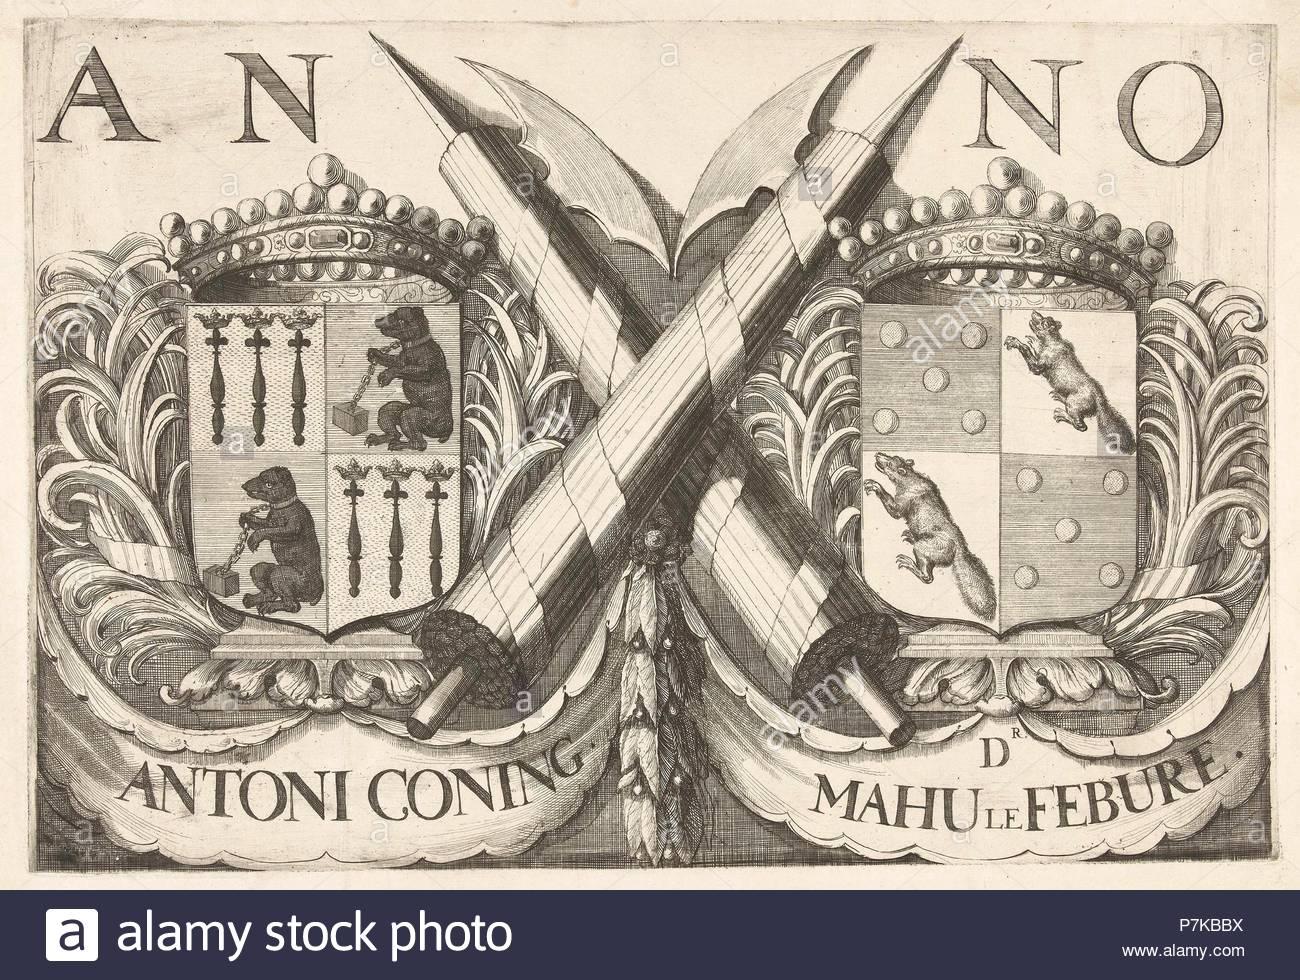 Coat Of Arms Of Antoni Coning Mayor Of Haarlem And Mahu Le Febure